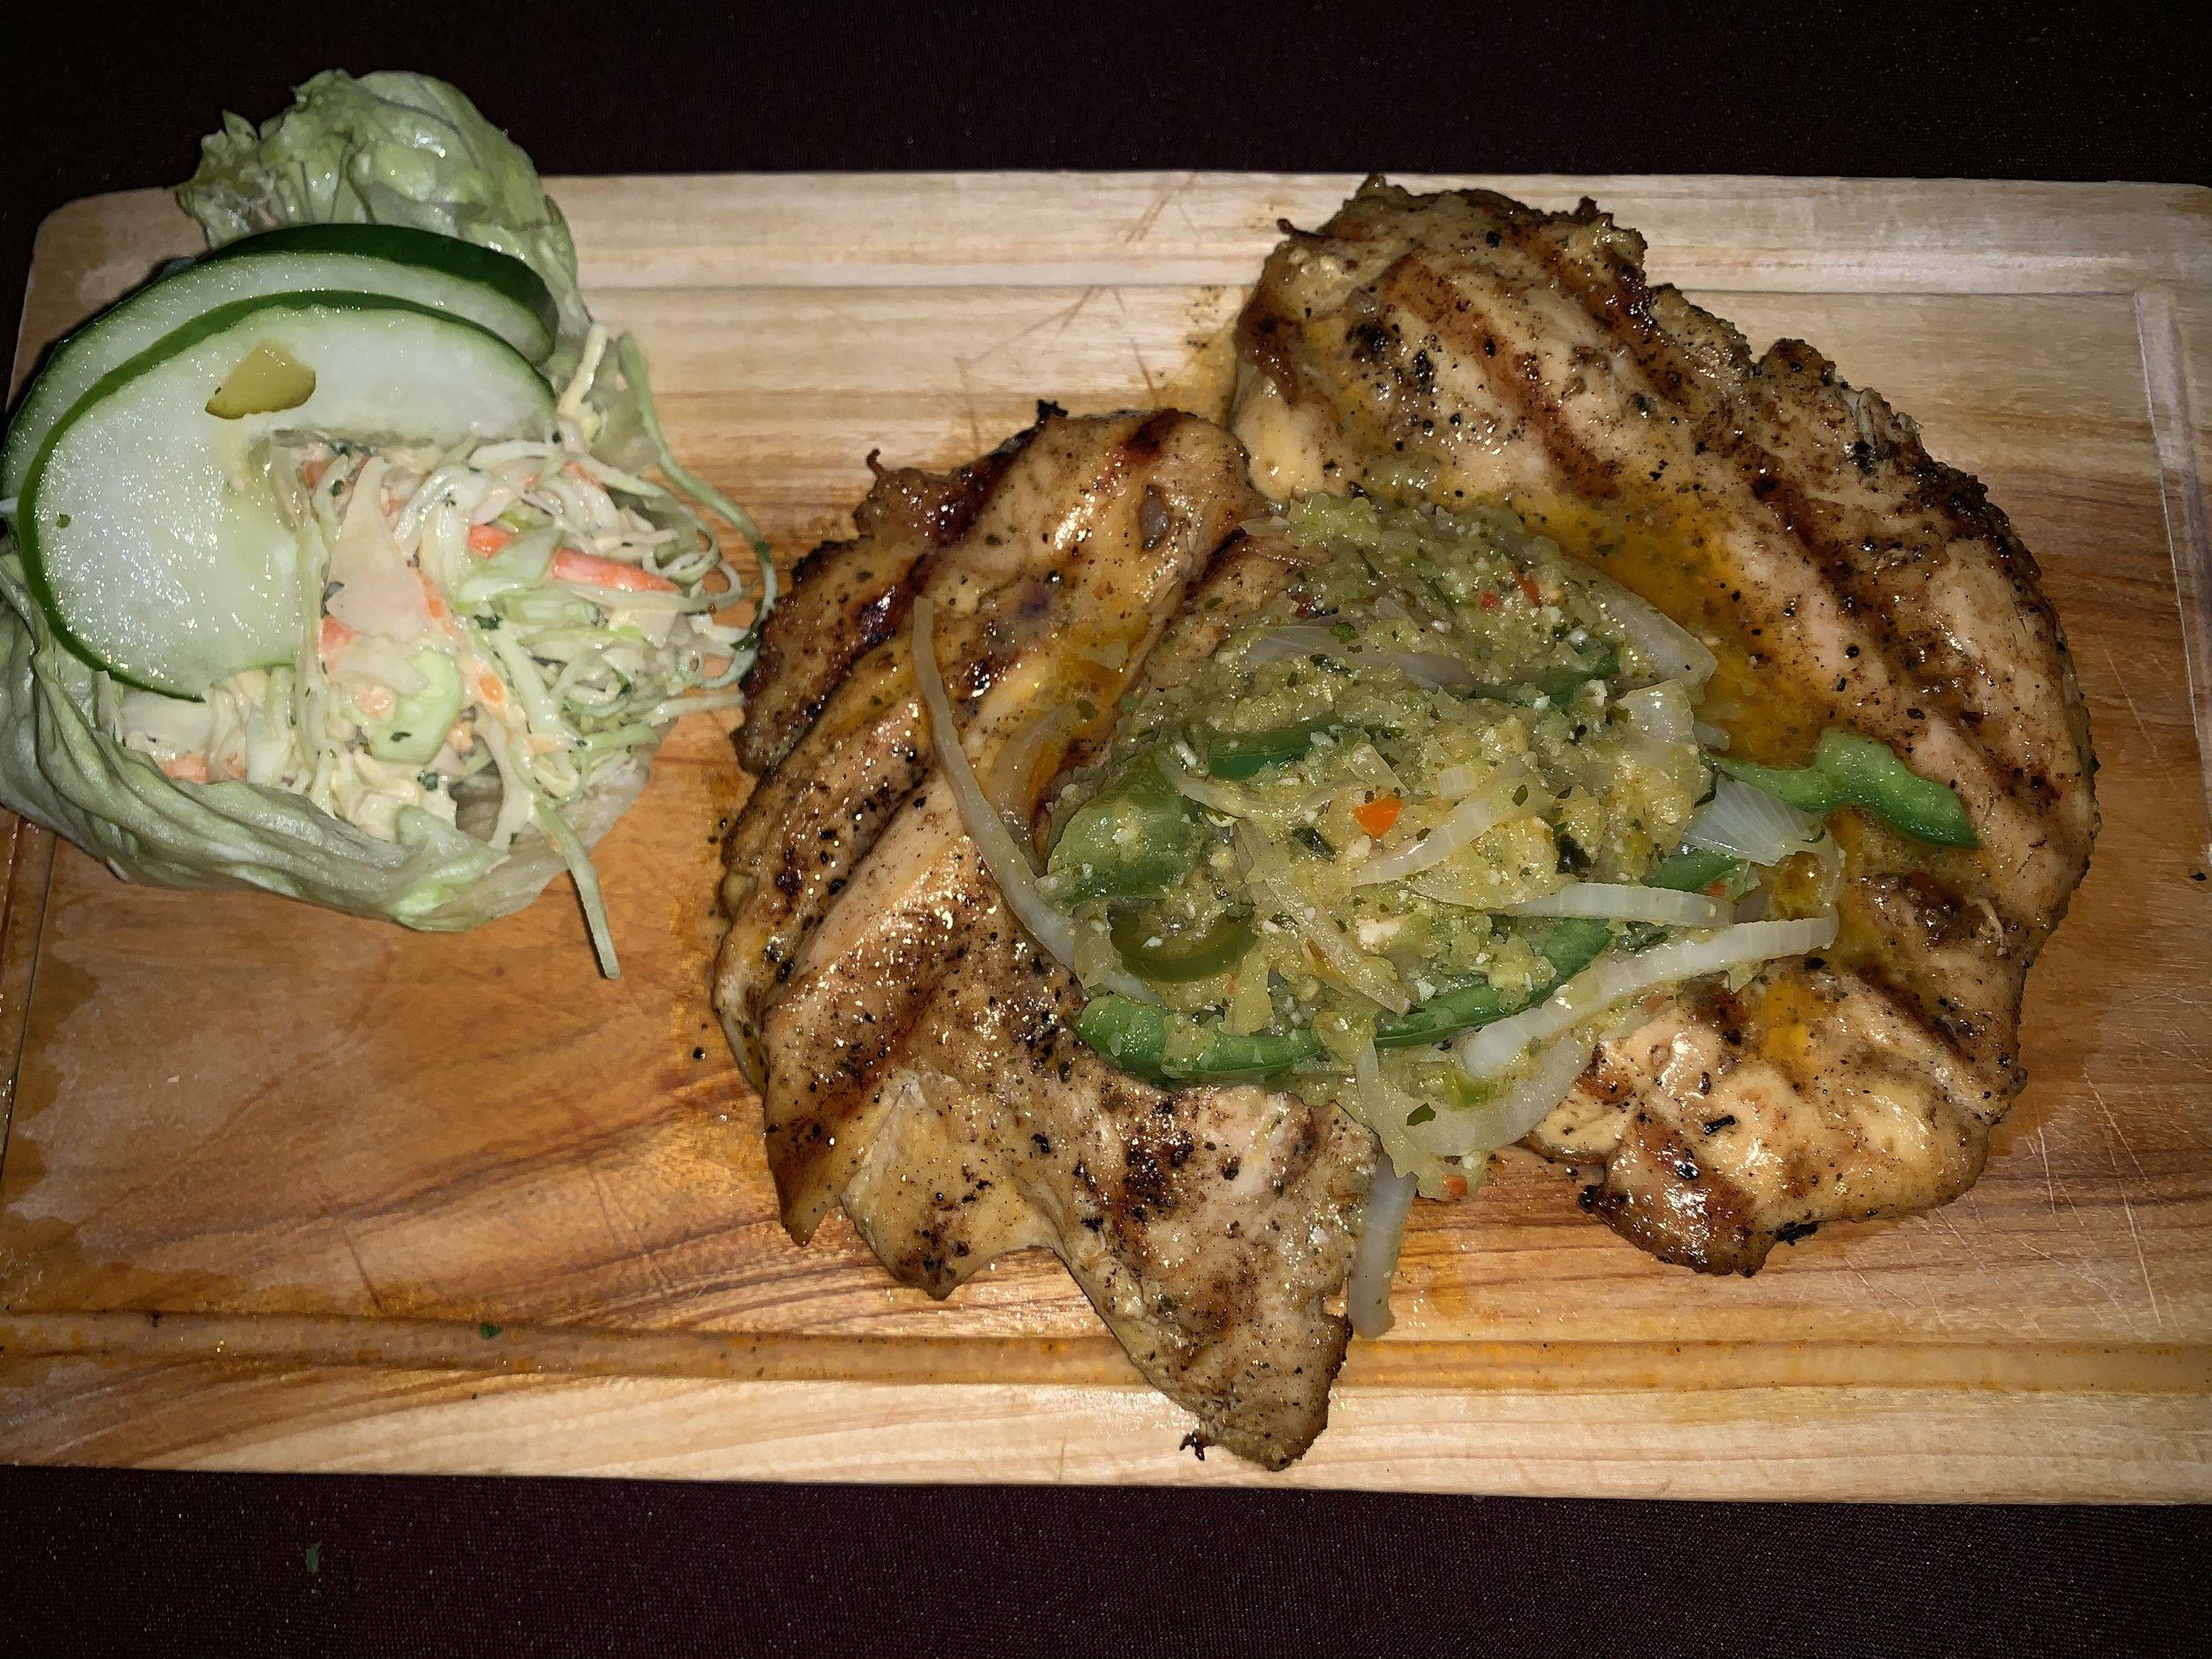 Steak & Ribs Curacao Chicken.jpg